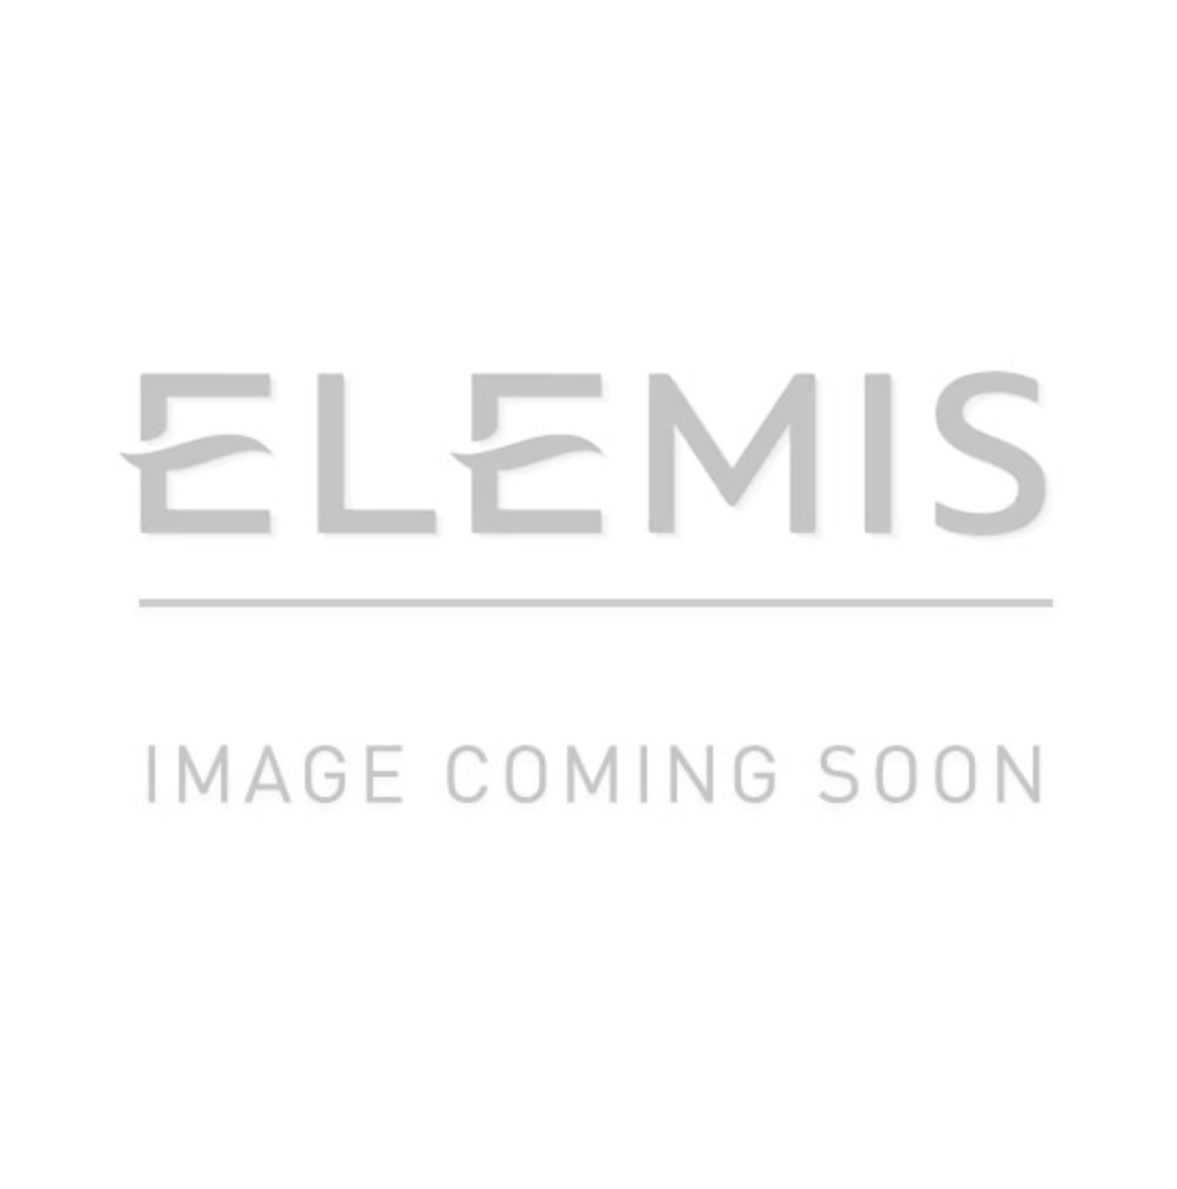 Elemis BIOTEC Skin Energising Day Cream - Combination 30ml/1oz Bobbi Brown - Extra Tinted Moisturizing Balm SPF25 - Medium Tint -30ml/1oz